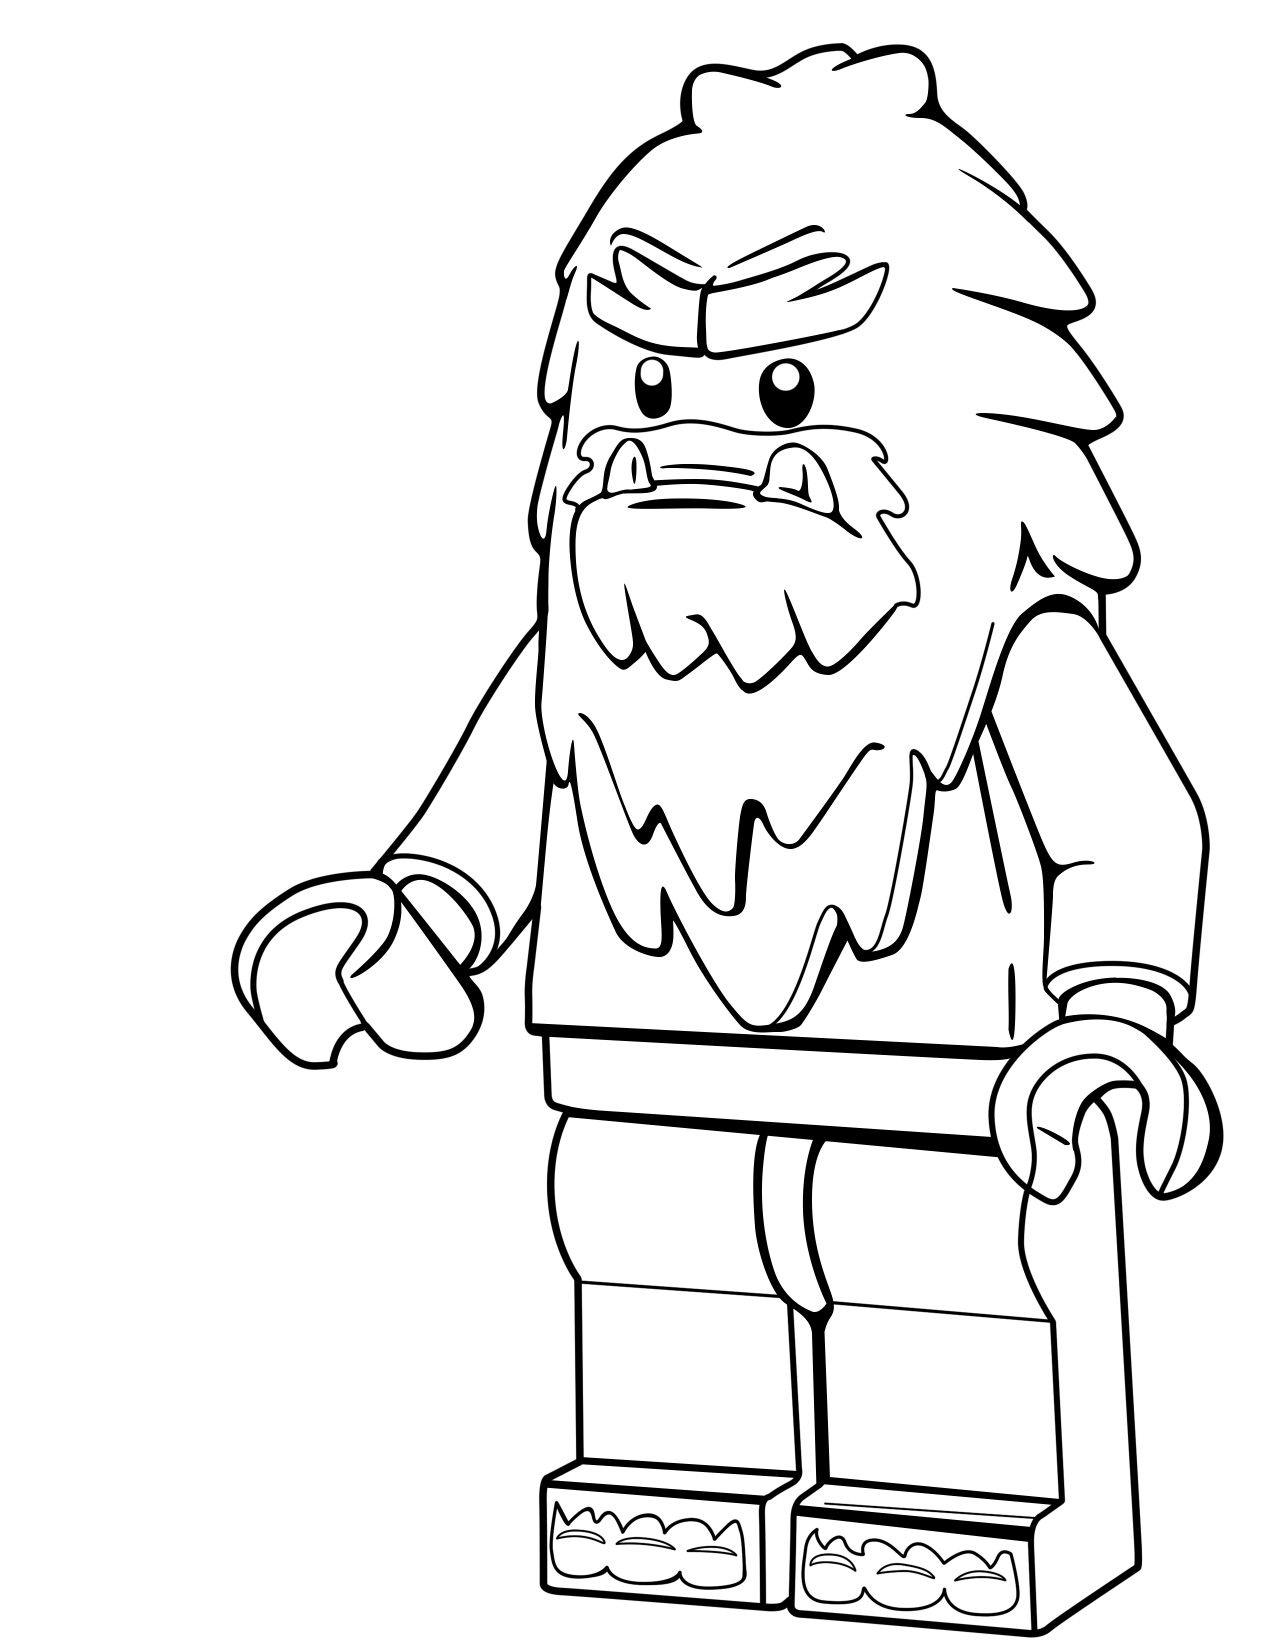 Free Printable Bigfoot Coloring Pages - Workberdubeat Coloring